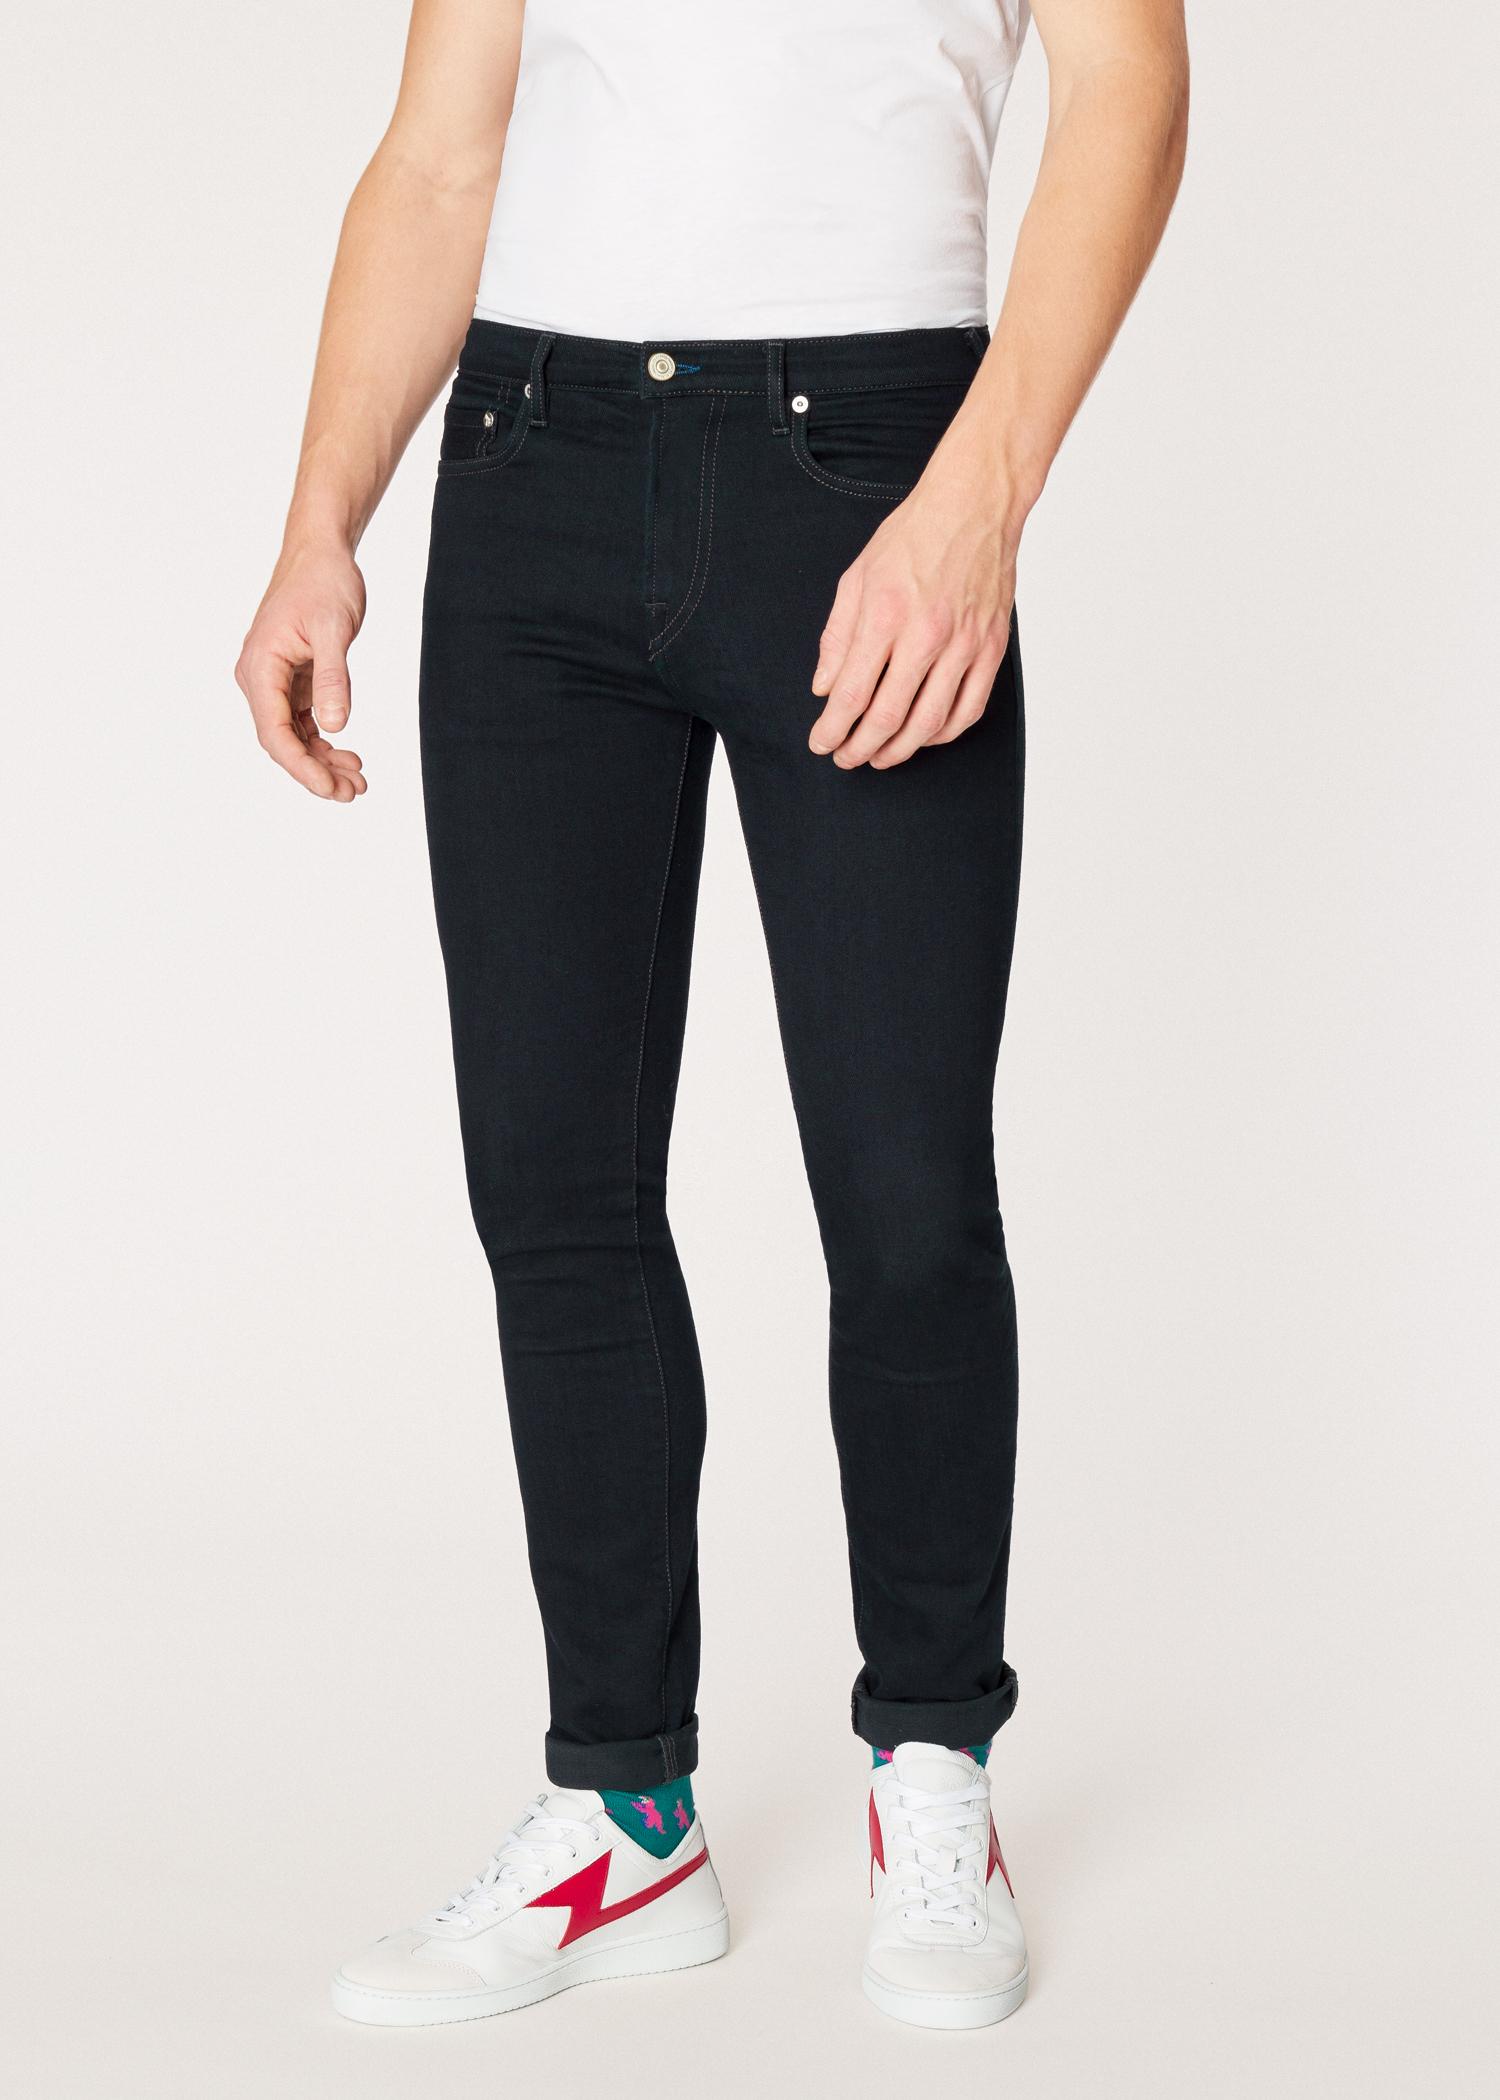 ae375a23bd05c Model front close up - Men's Slim-Standard 'Blue/Black Reflex' Jeans